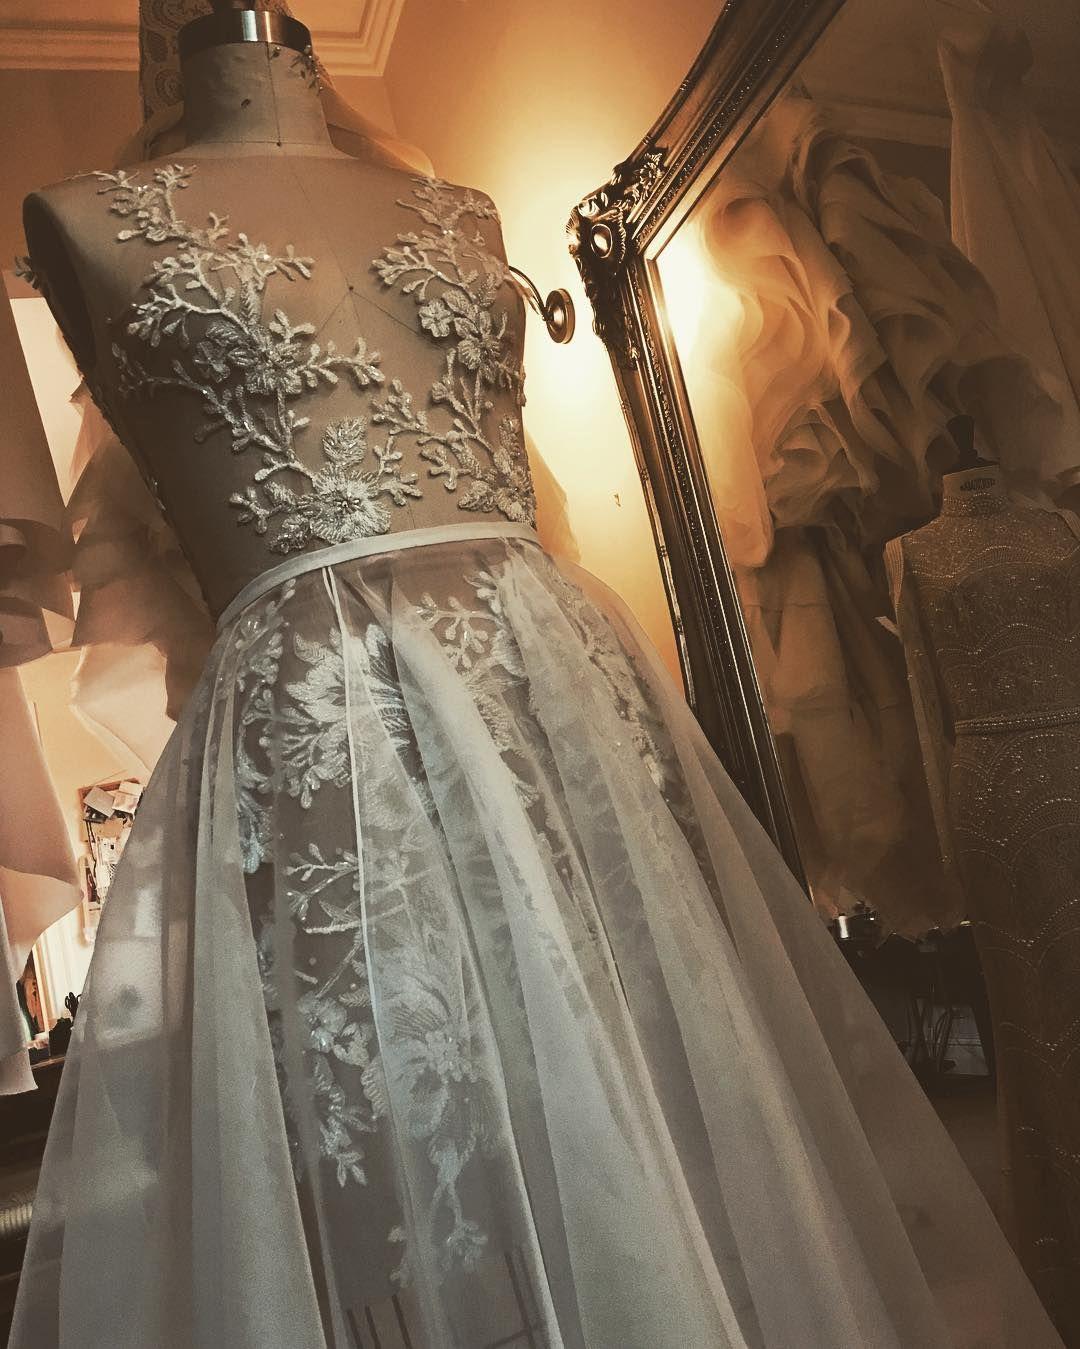 A new sample in the making.... #detachableskirt #bride #bridalcouture #bridetobe #custommade #contemporarycouture #contemporarybride #helenmanuell #guipurelace #frenchlace #couture #couturebride #couturefabrics #bridalinspiration #wedding #weddingdress #weddinginspiration #melbbride #australianbride #sydneybride #australiandesigner #nycbride #dubaibride #internationalbride #bridaldesigner #weddedwonderland #bridalbutterfly #cosmobride #luxefashionblogger  #thedreamdayco